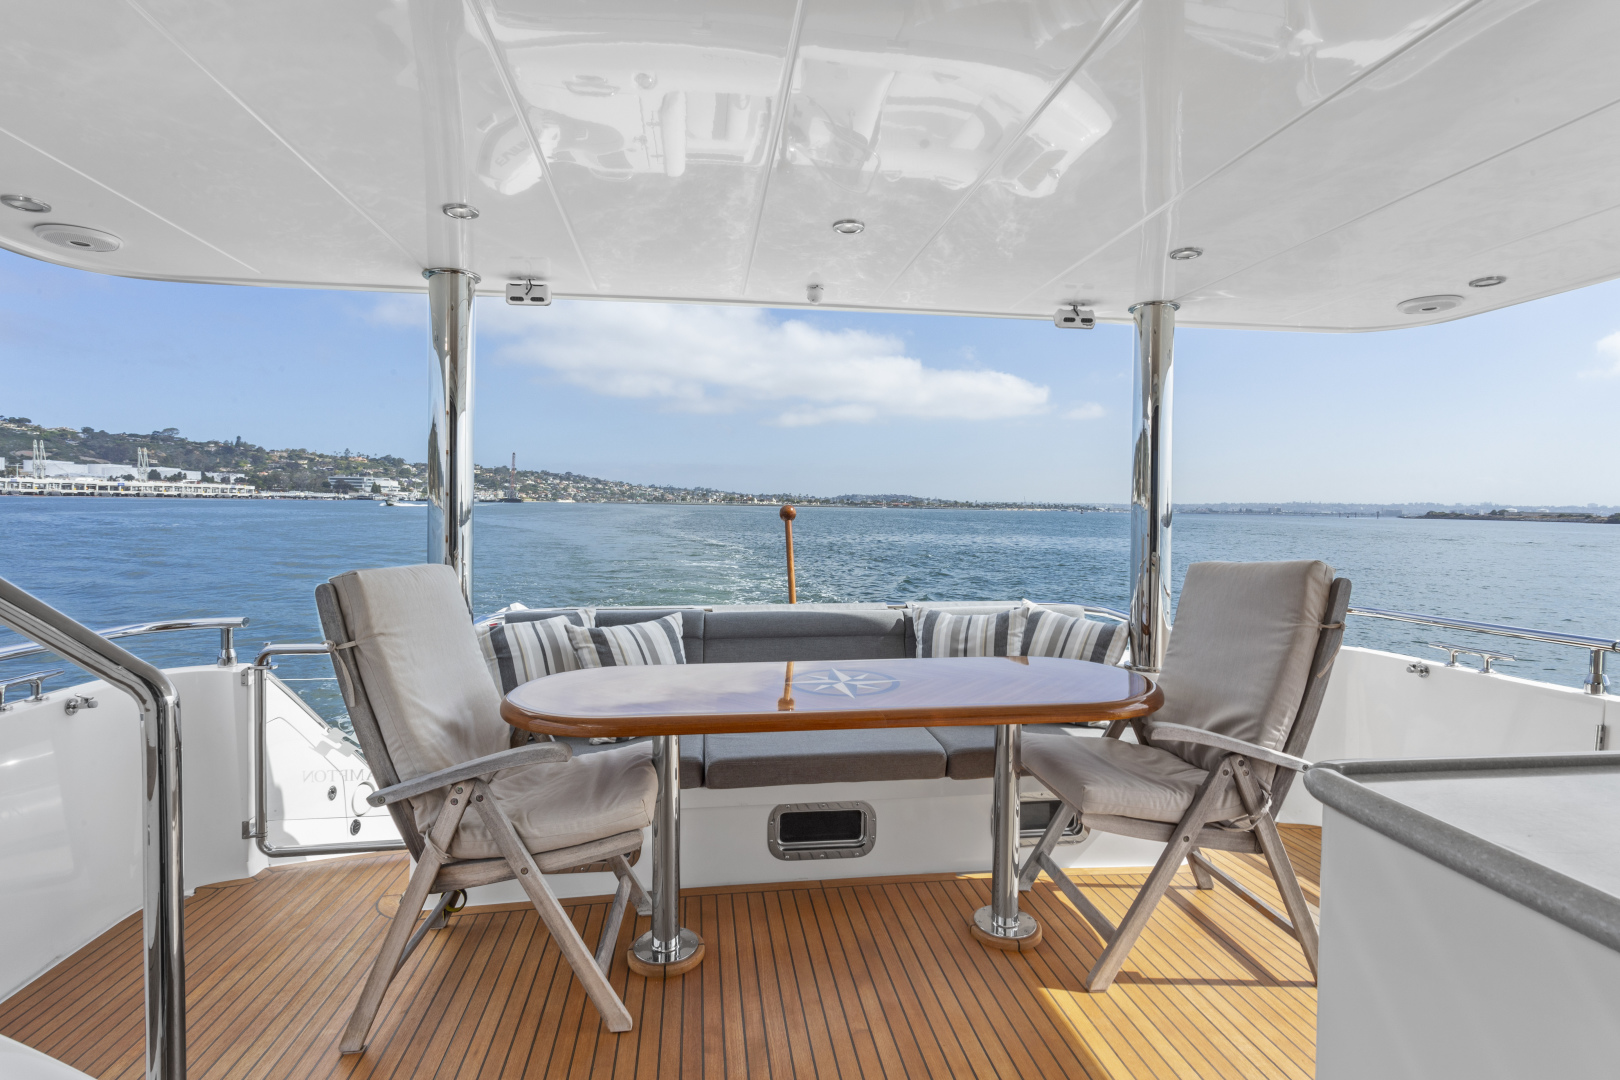 Hampton-76 Skylounge Motoryacht 2014-ODYSEA San Diego-California-United States-AFT DECK-1165183 | Thumbnail